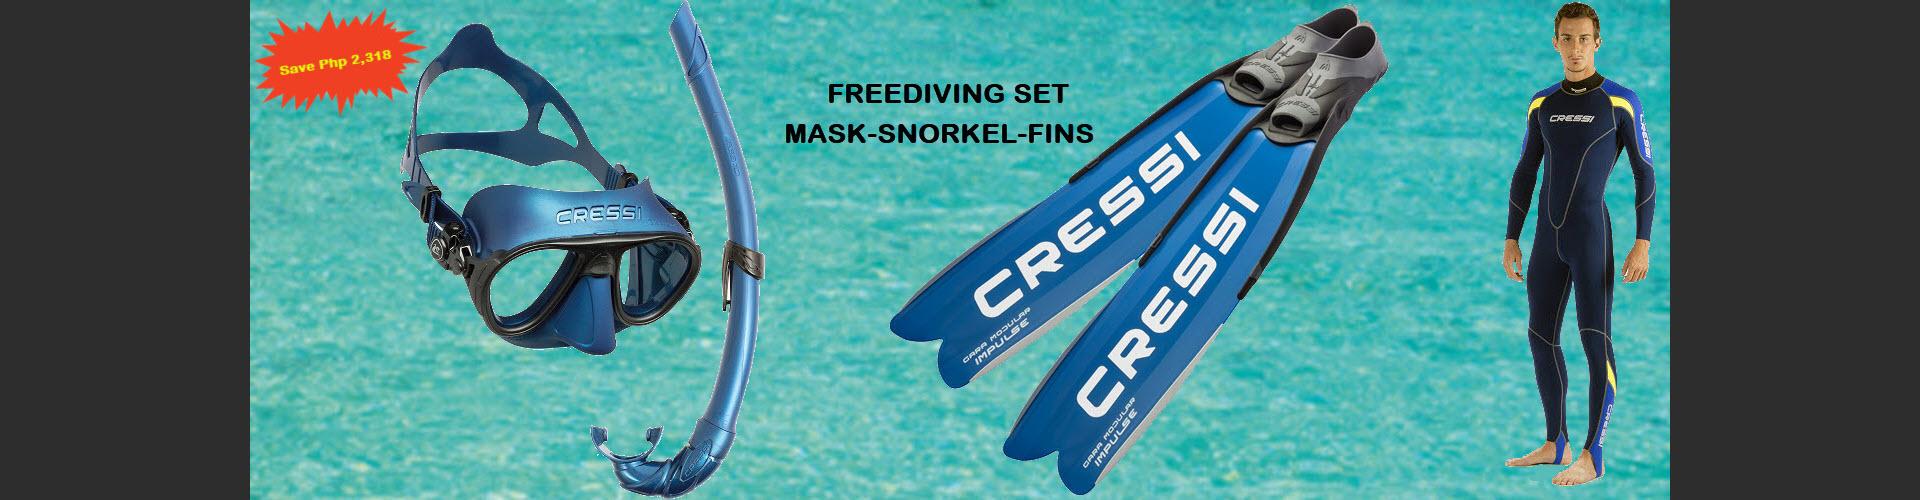 Freediving complete set